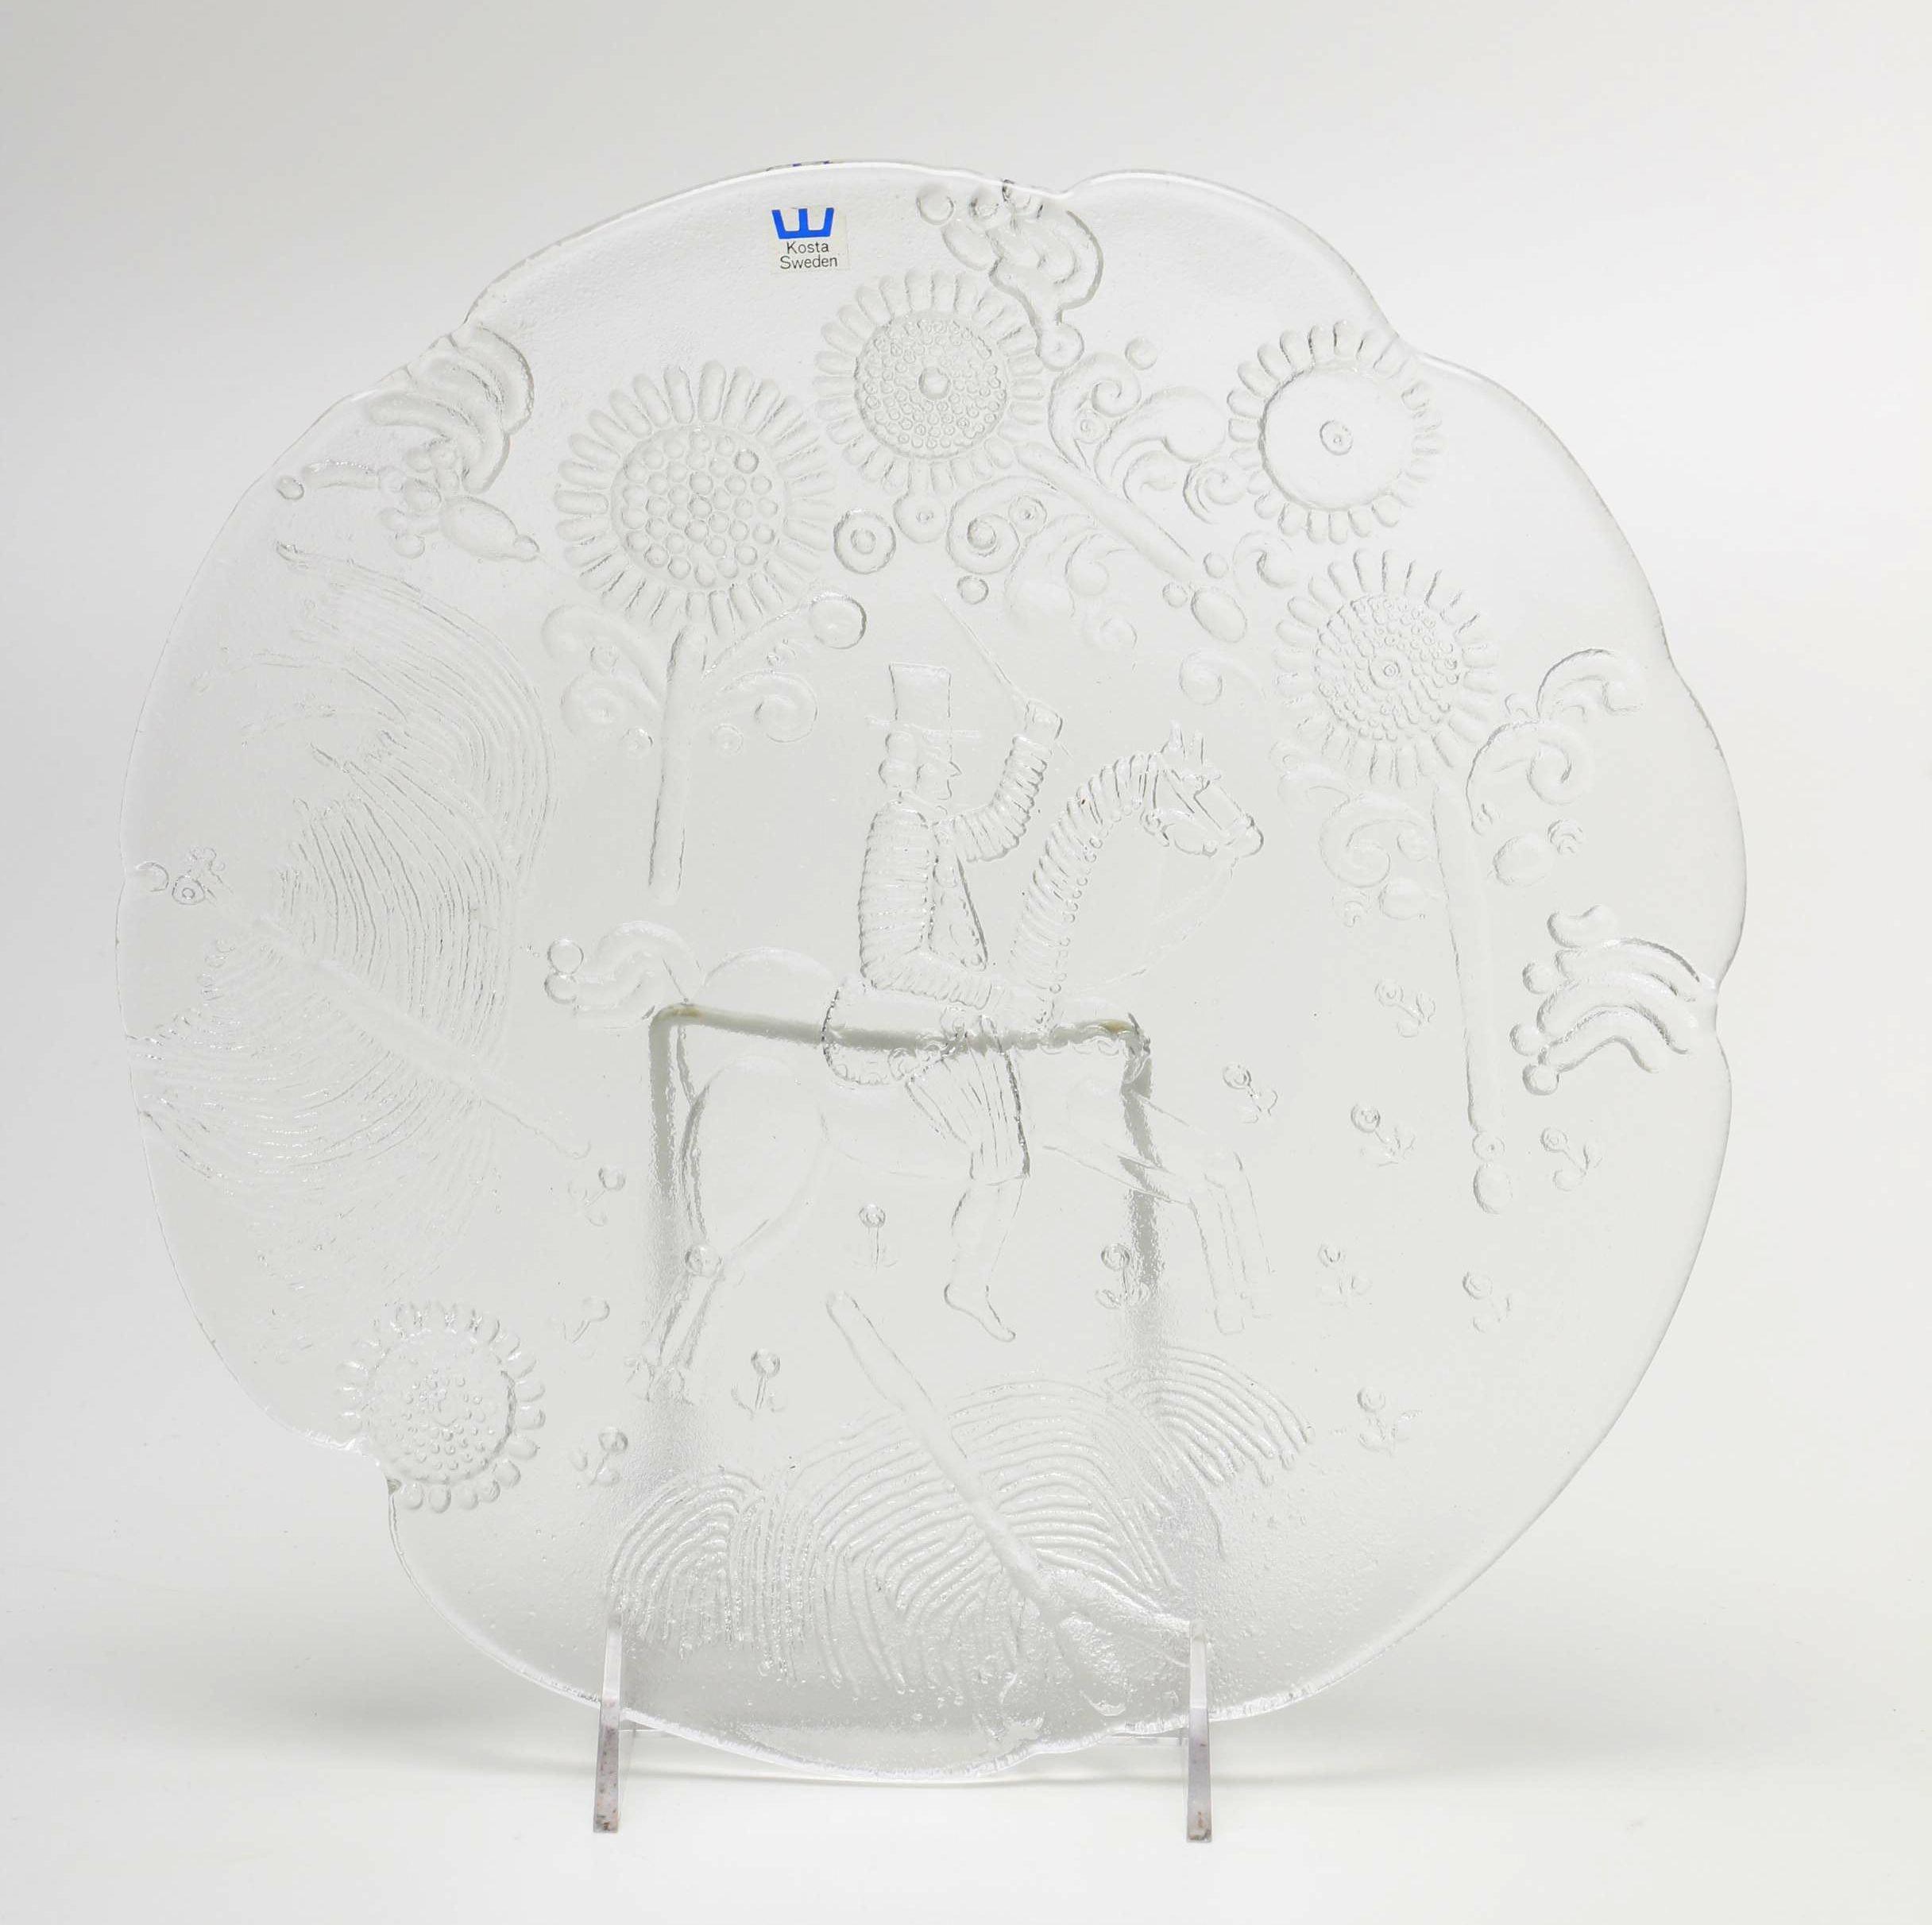 Ann and Göran Wärff Embossed Glass Platter by Kosta